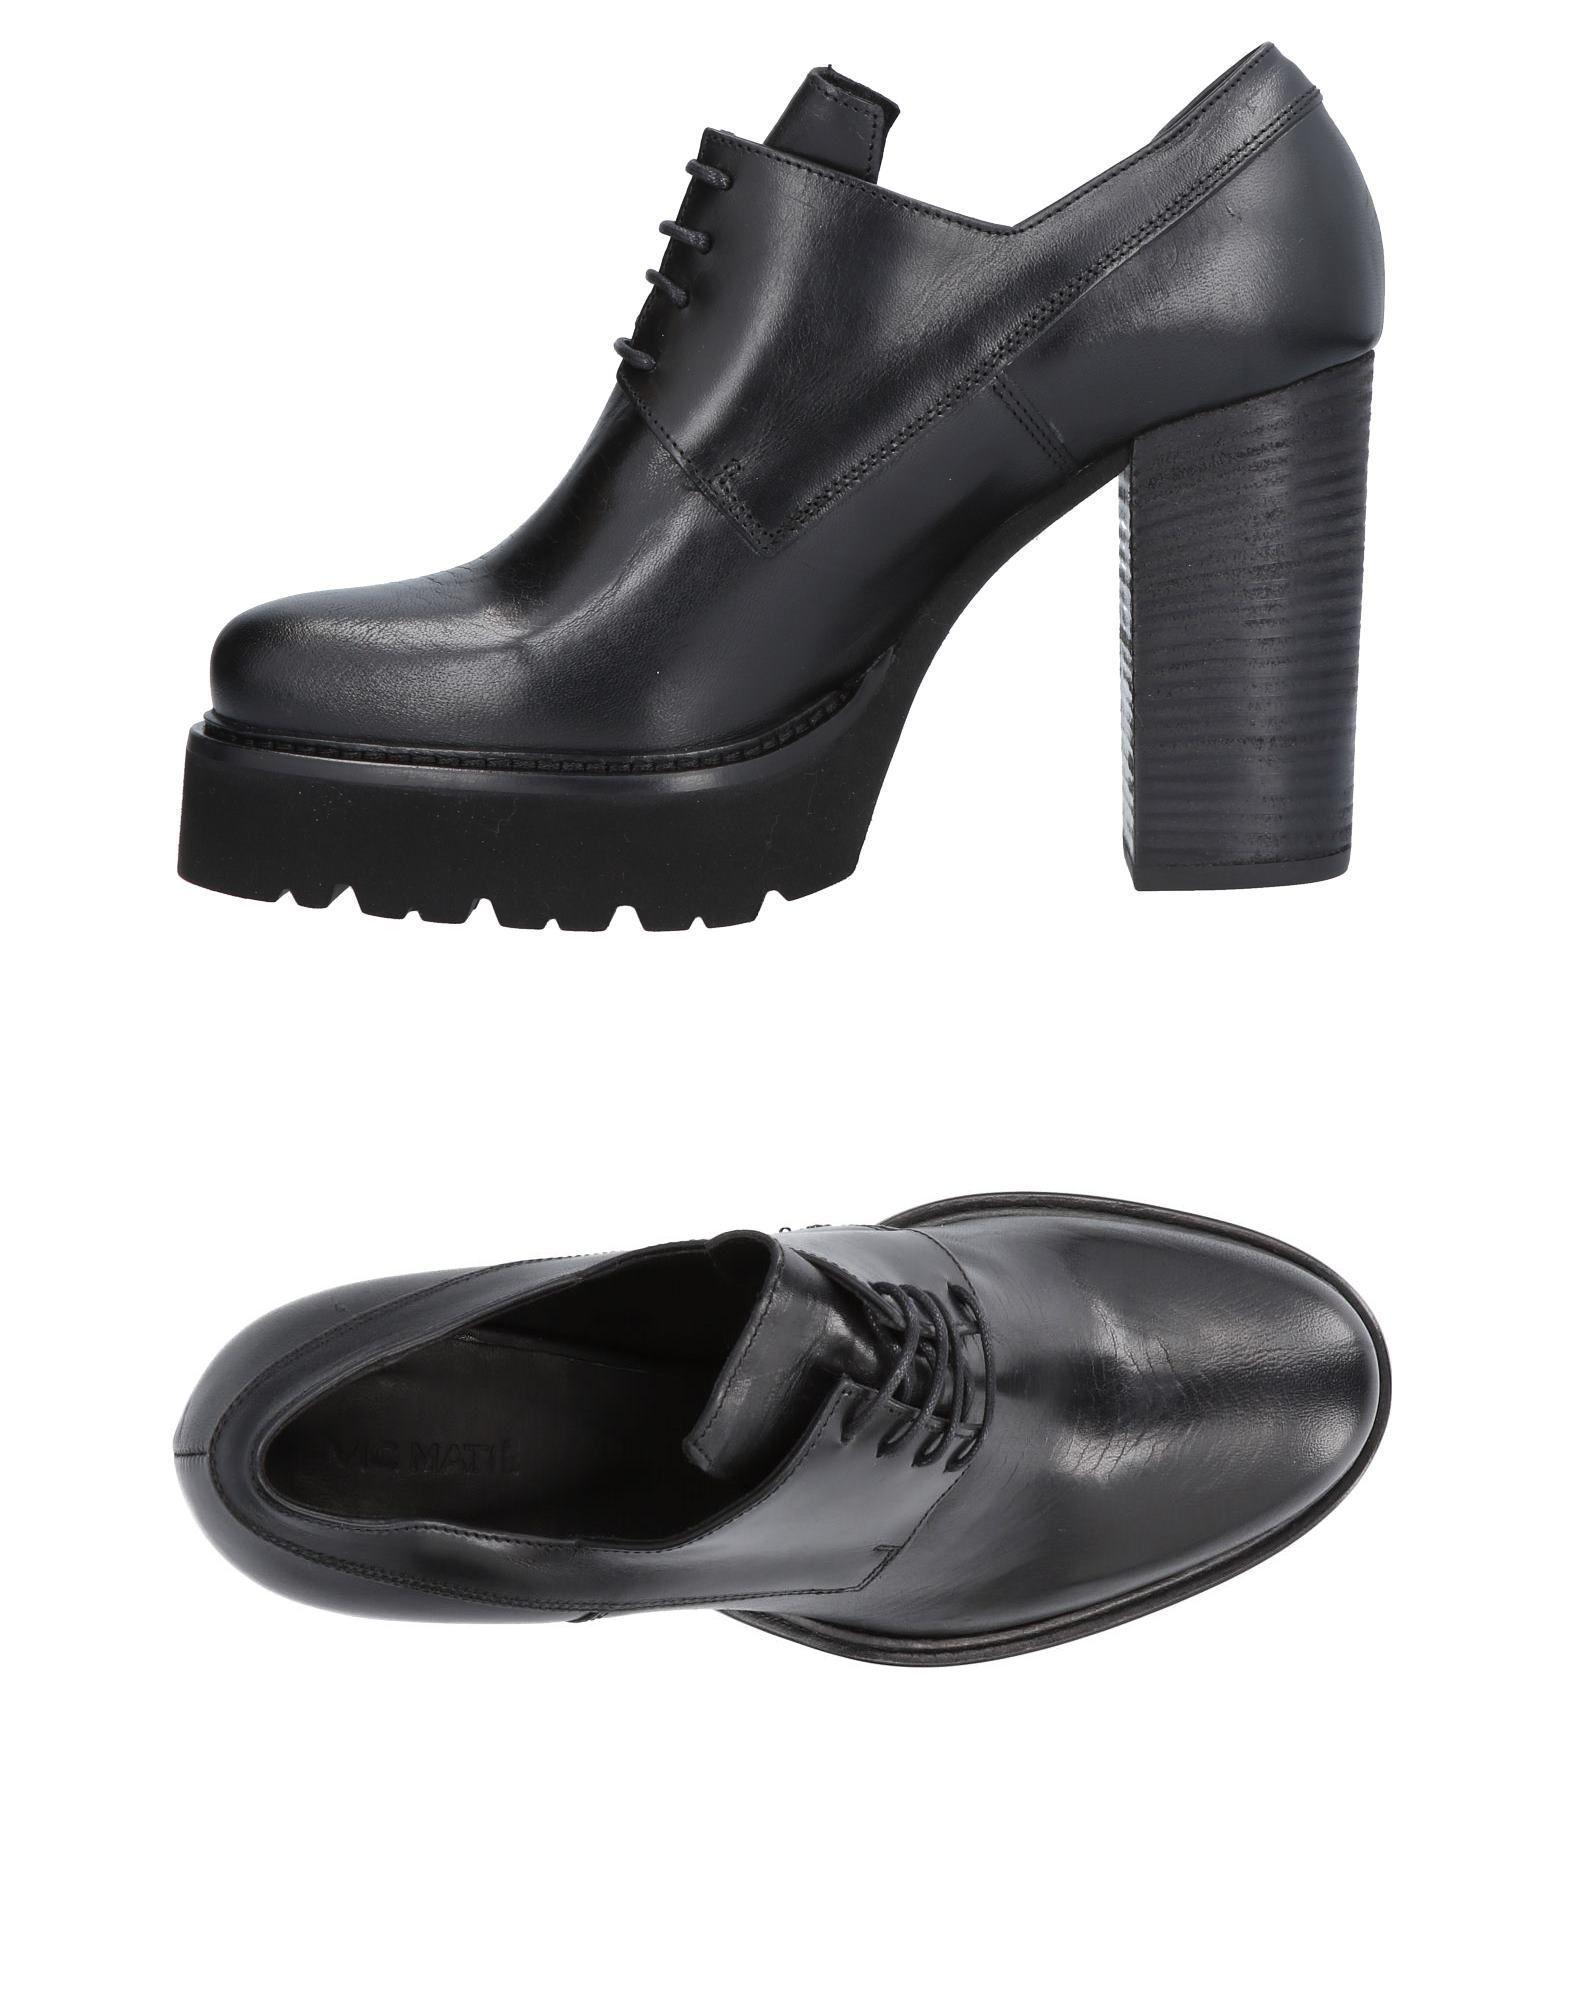 FOOTWEAR - Lace-up shoes Vic Mati DEdu6zq